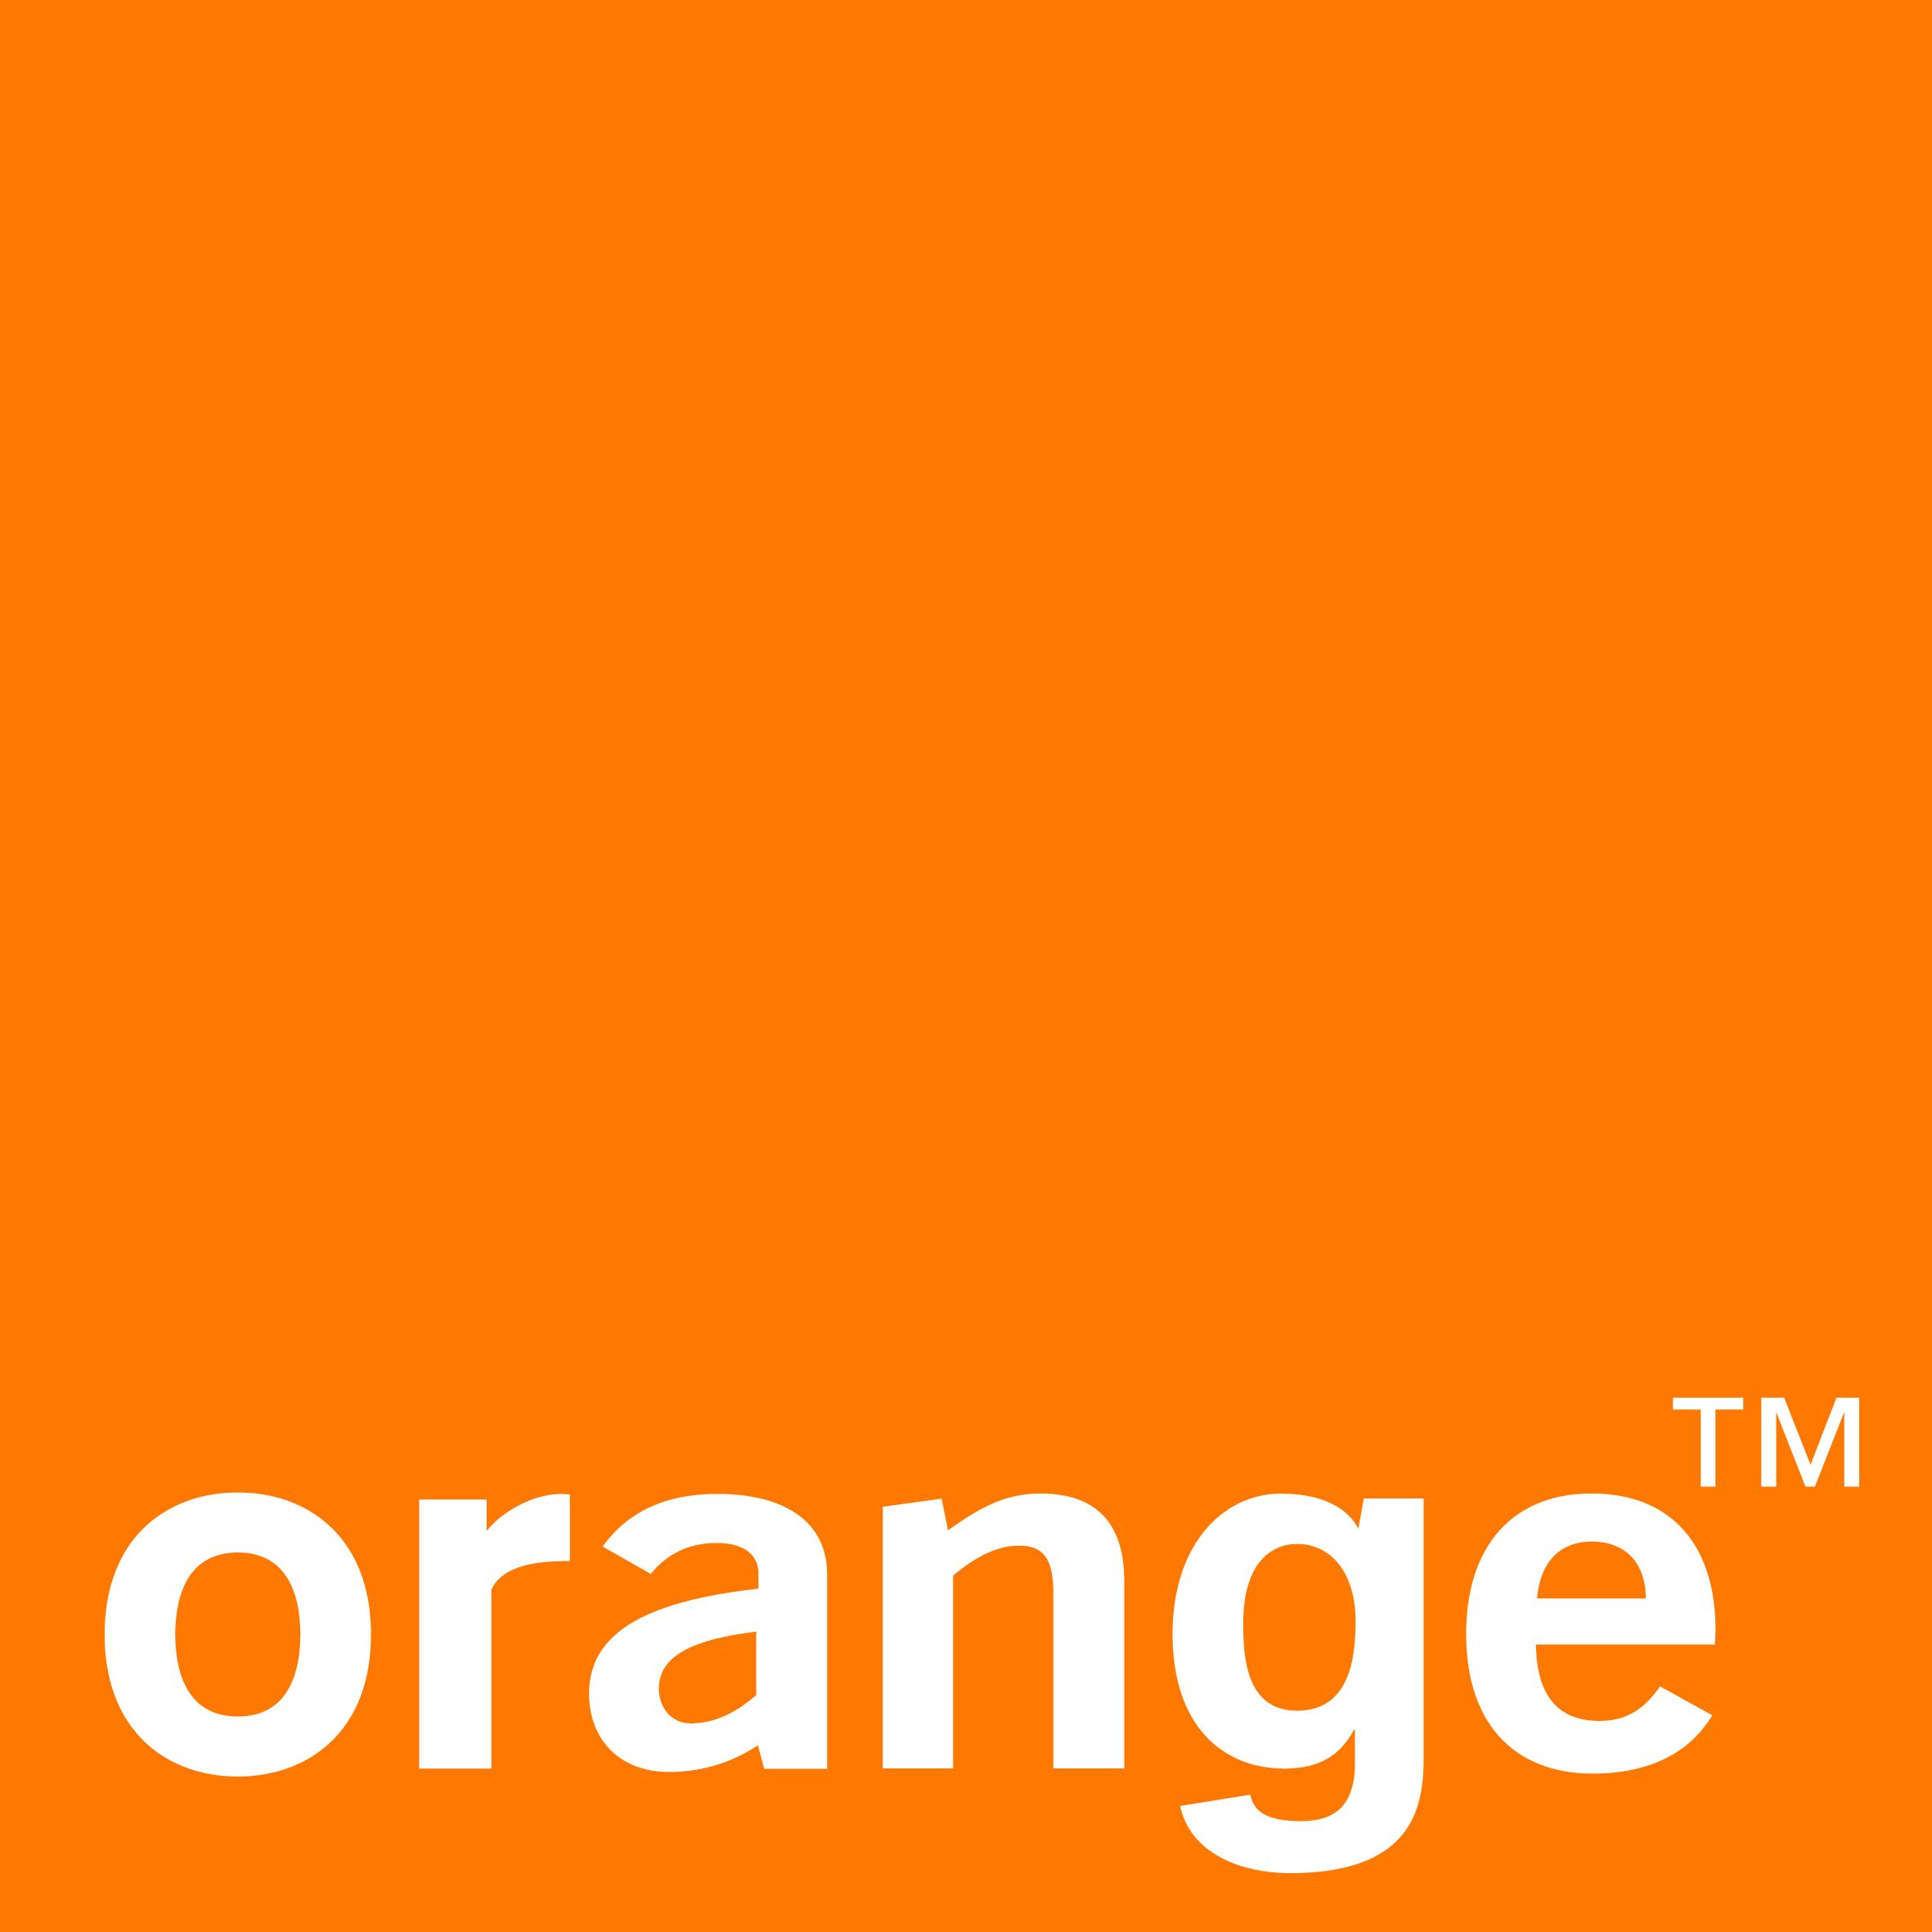 /images/com_odtatierkdunaju/teams/2019_Bud--cnos---je-Orange.png